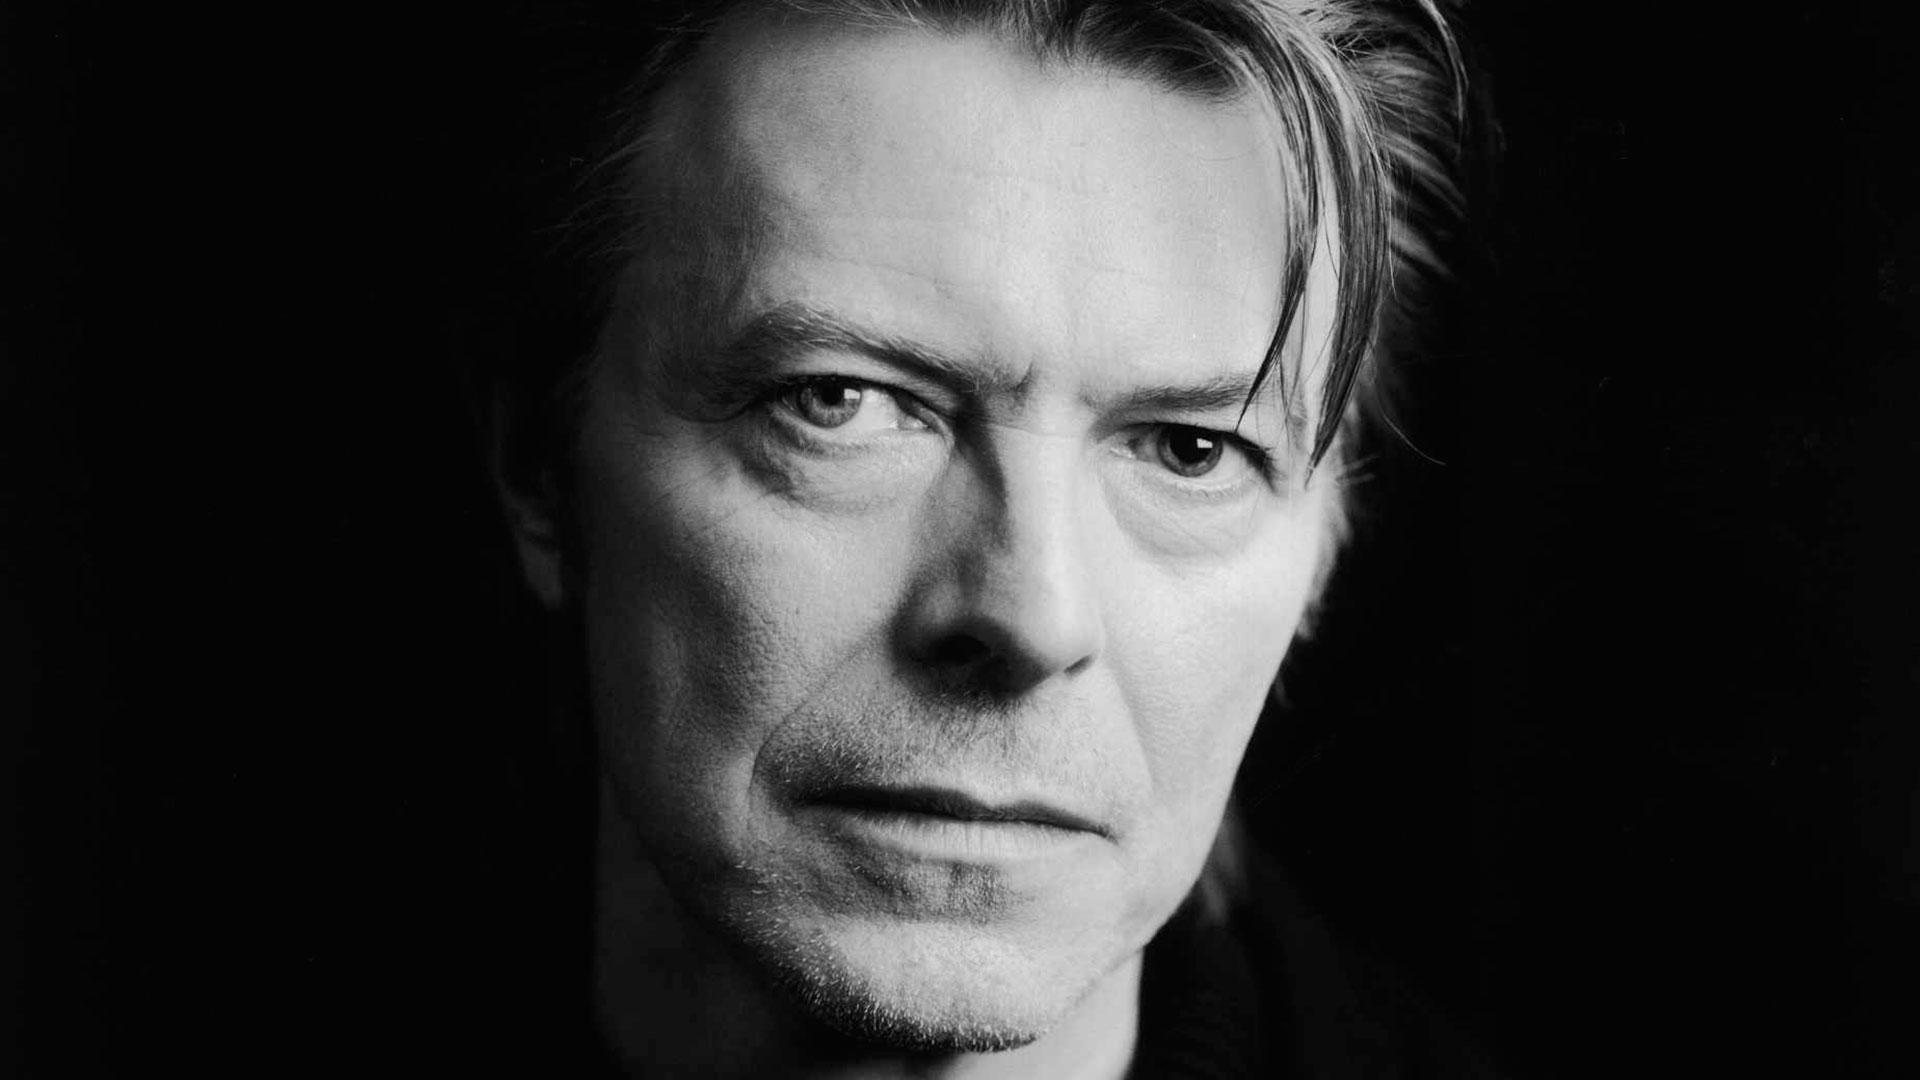 Bowie hero asset